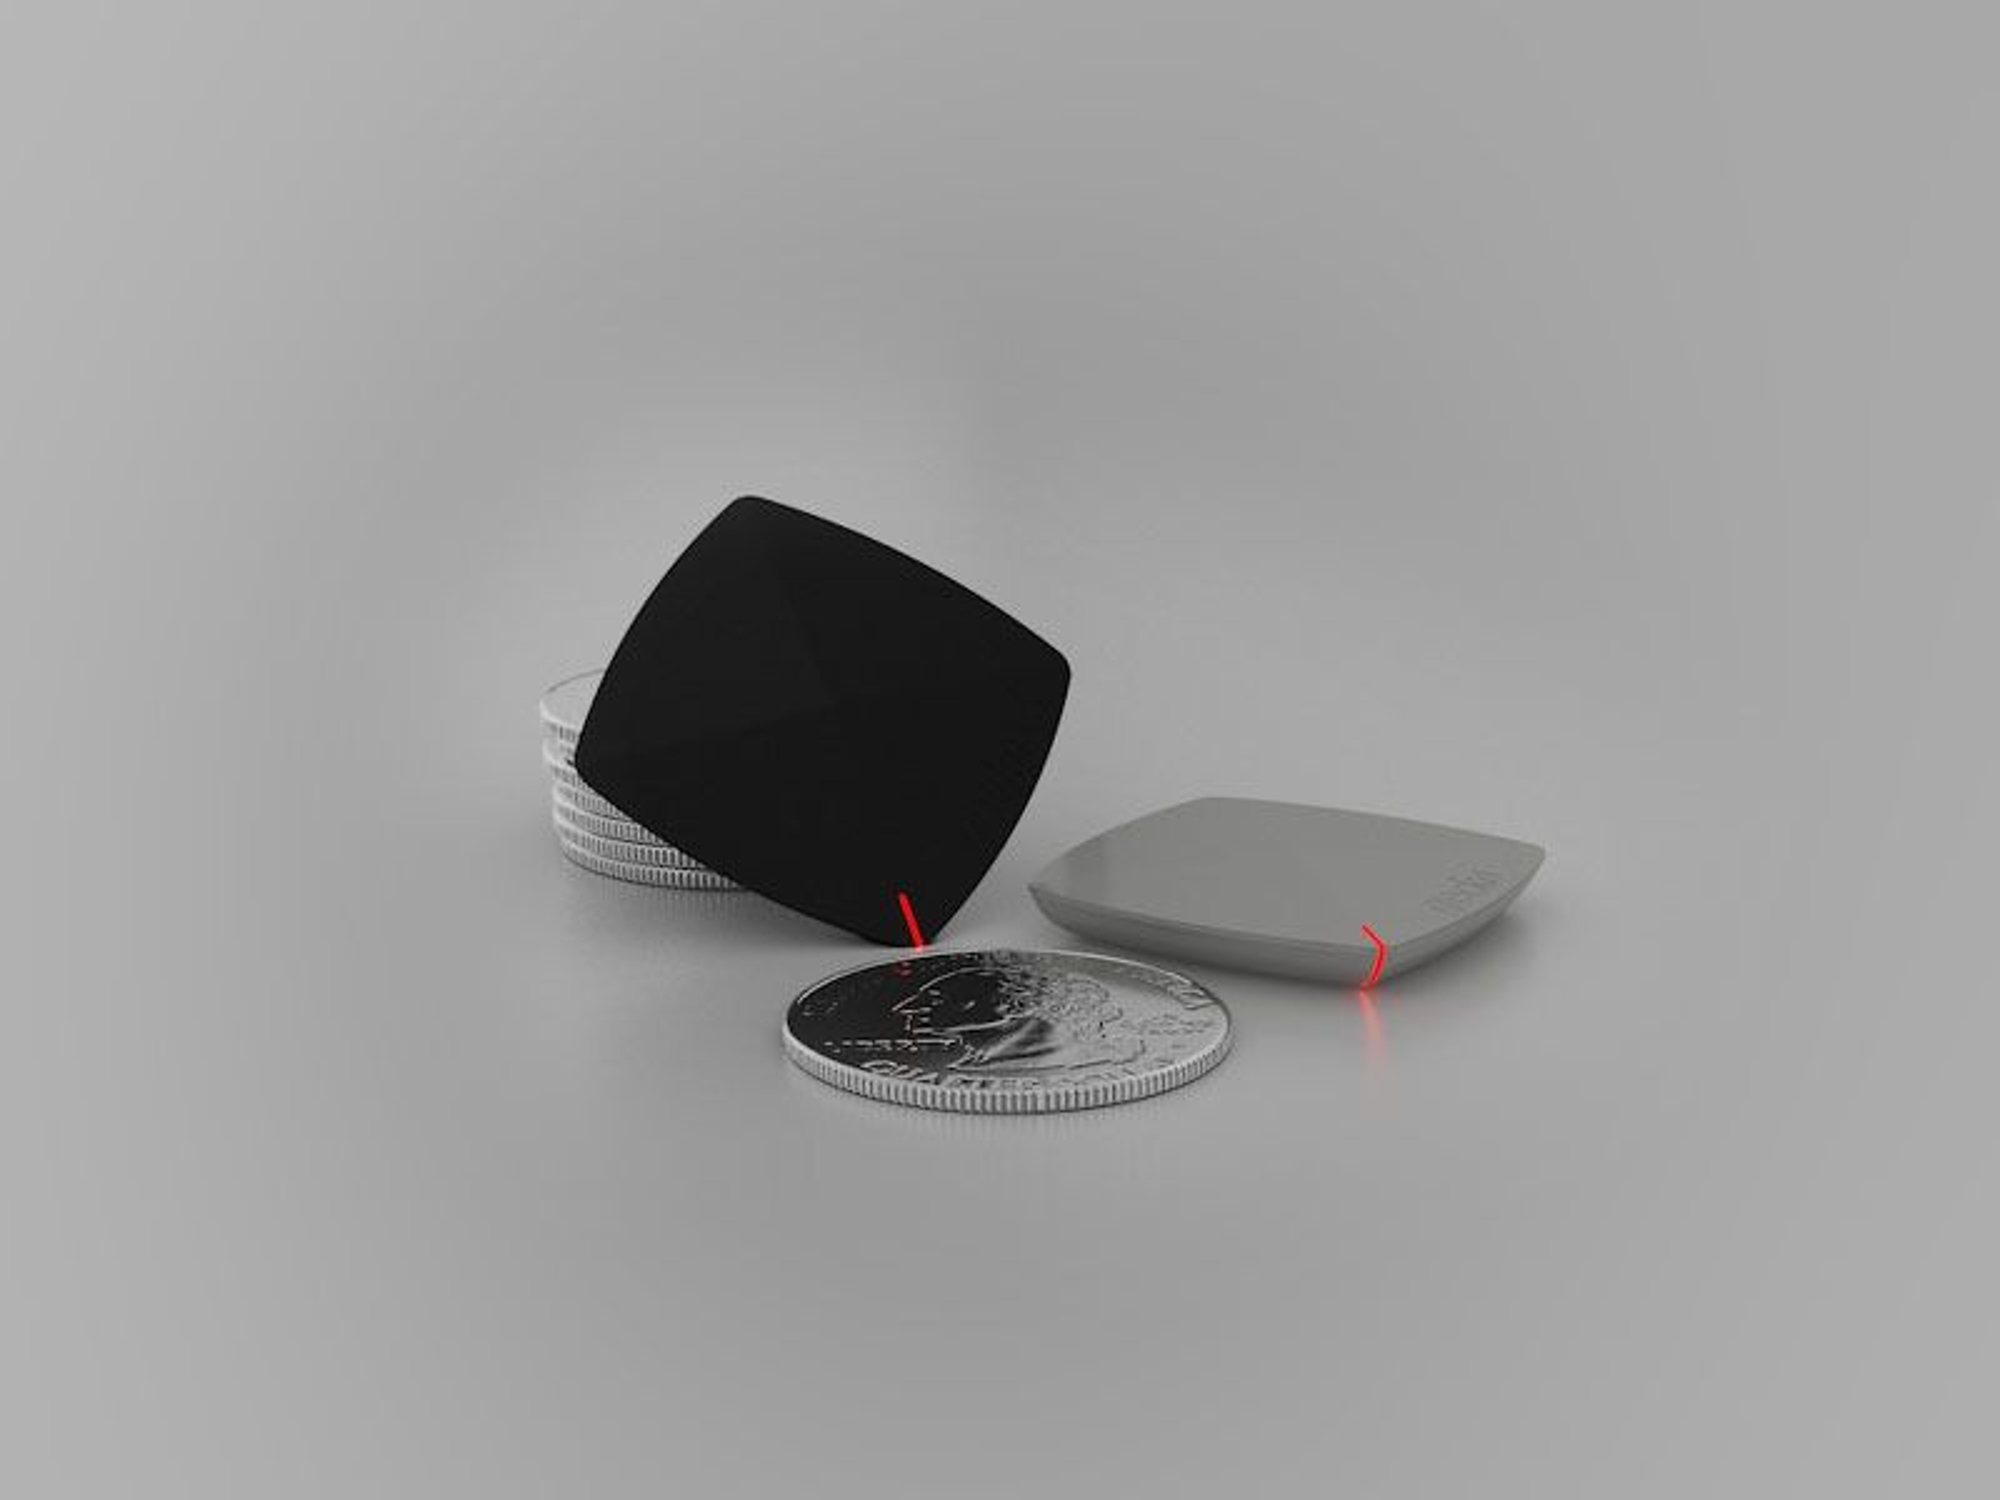 En fjernkontroll til mobilen